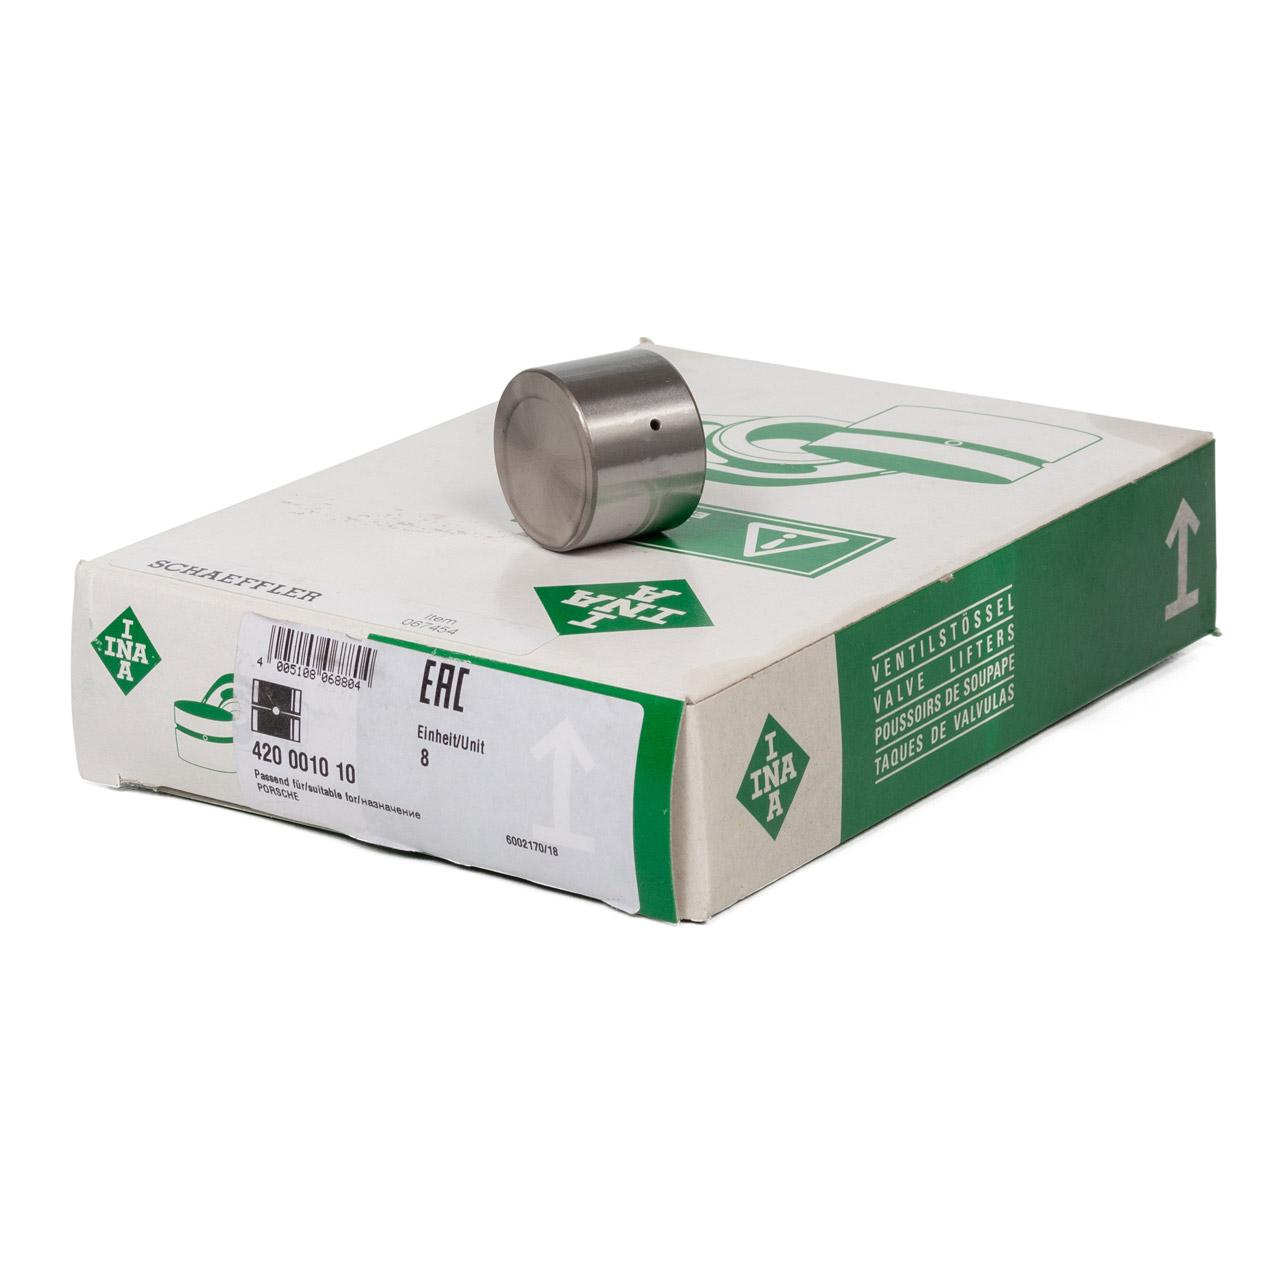 8x INA 420001010 Ventilstössel PORSCHE 928 5.0 5.4 944 2.5 S 3.0 S2 968 3.0